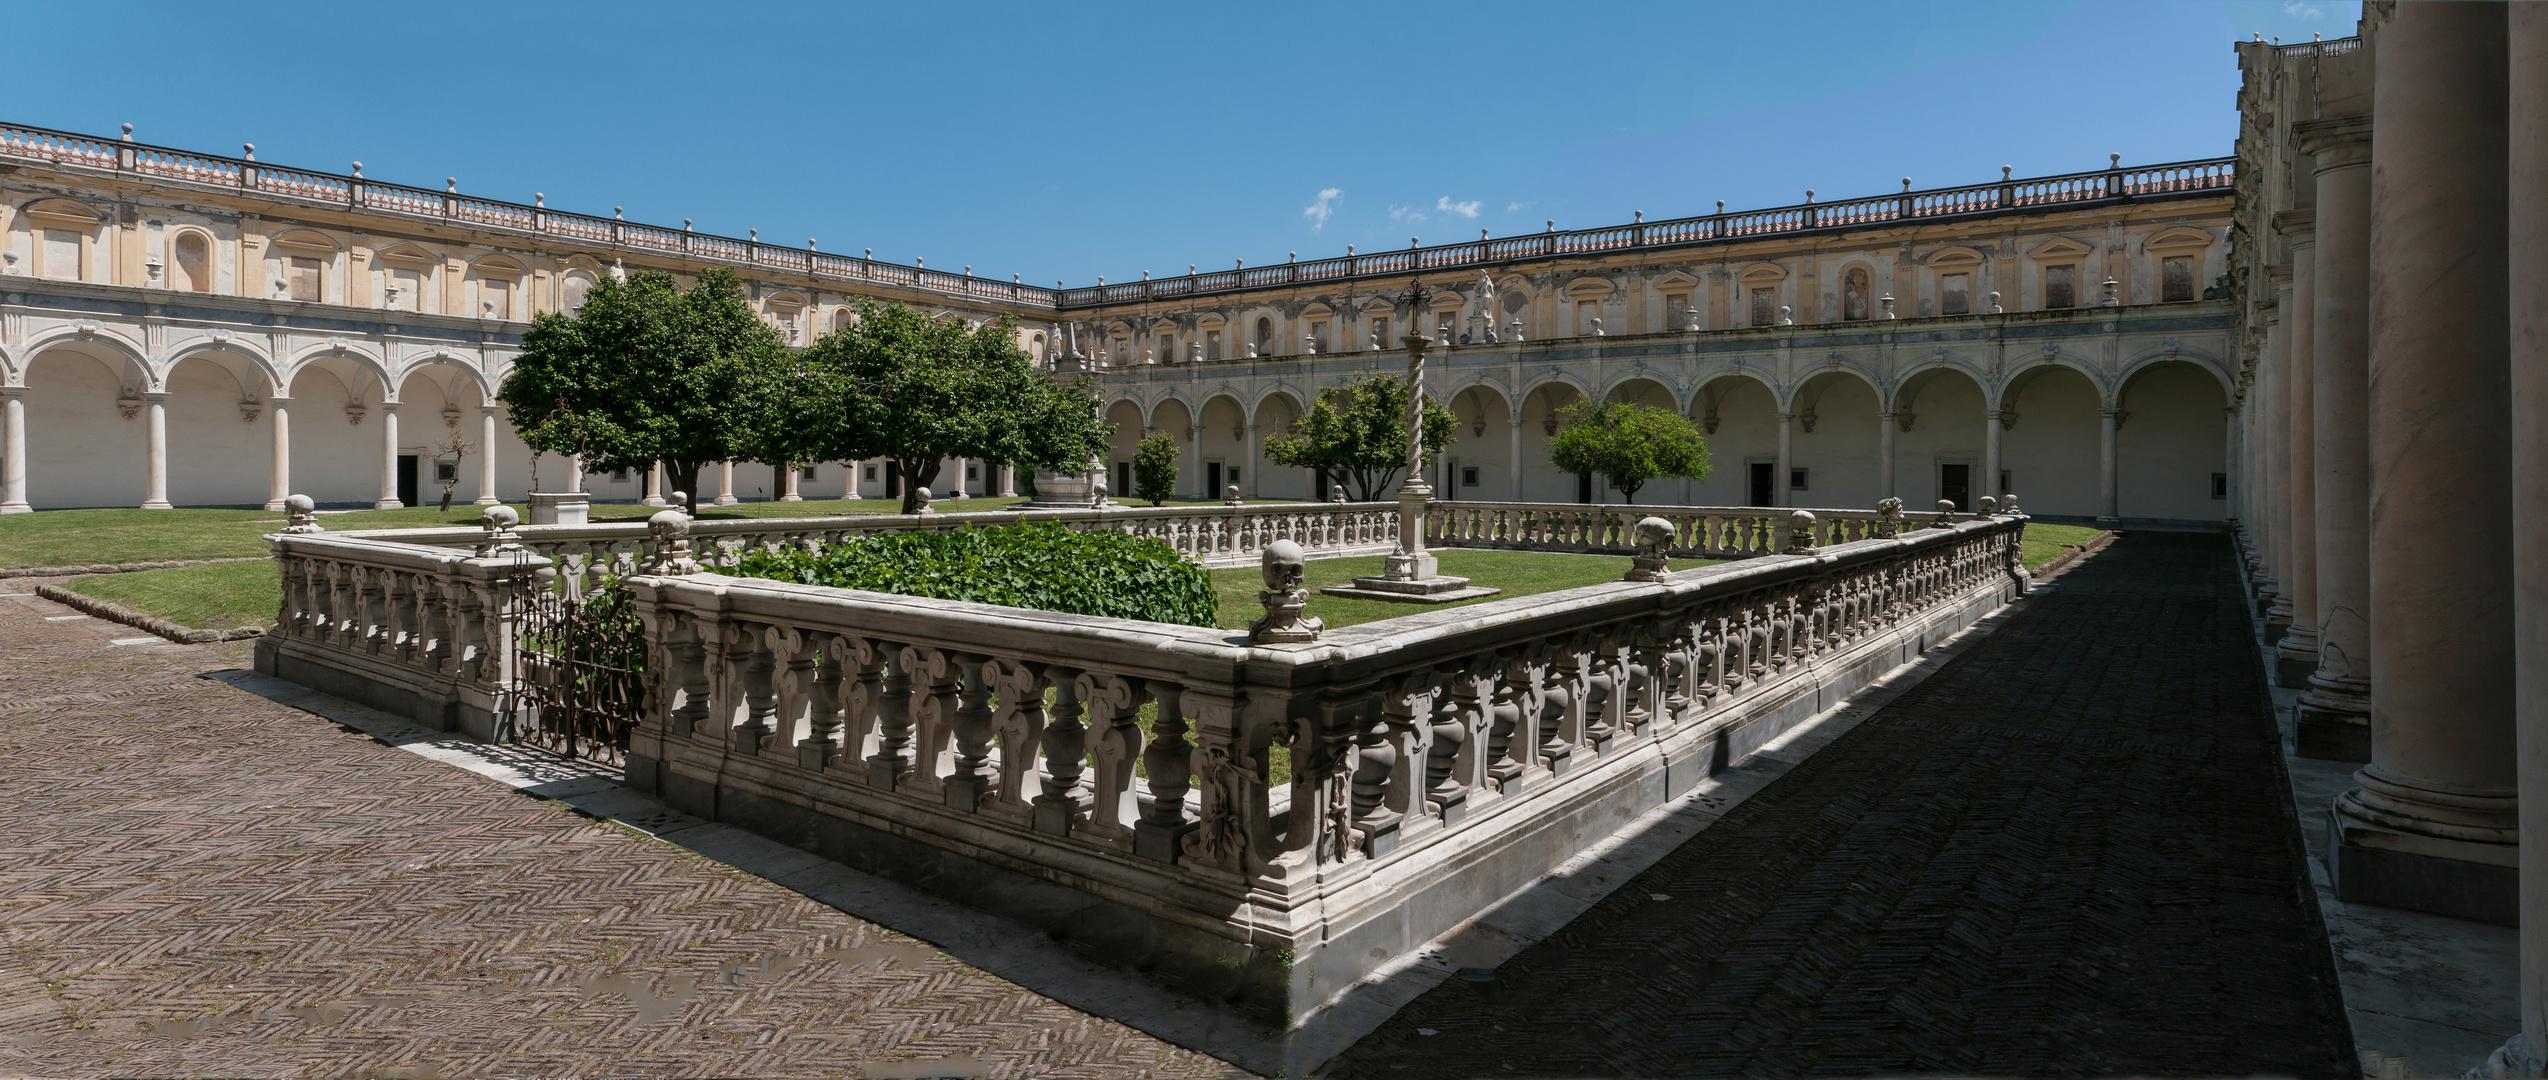 Mönchsfriedhof in der Certosa di San Martino, Napoli